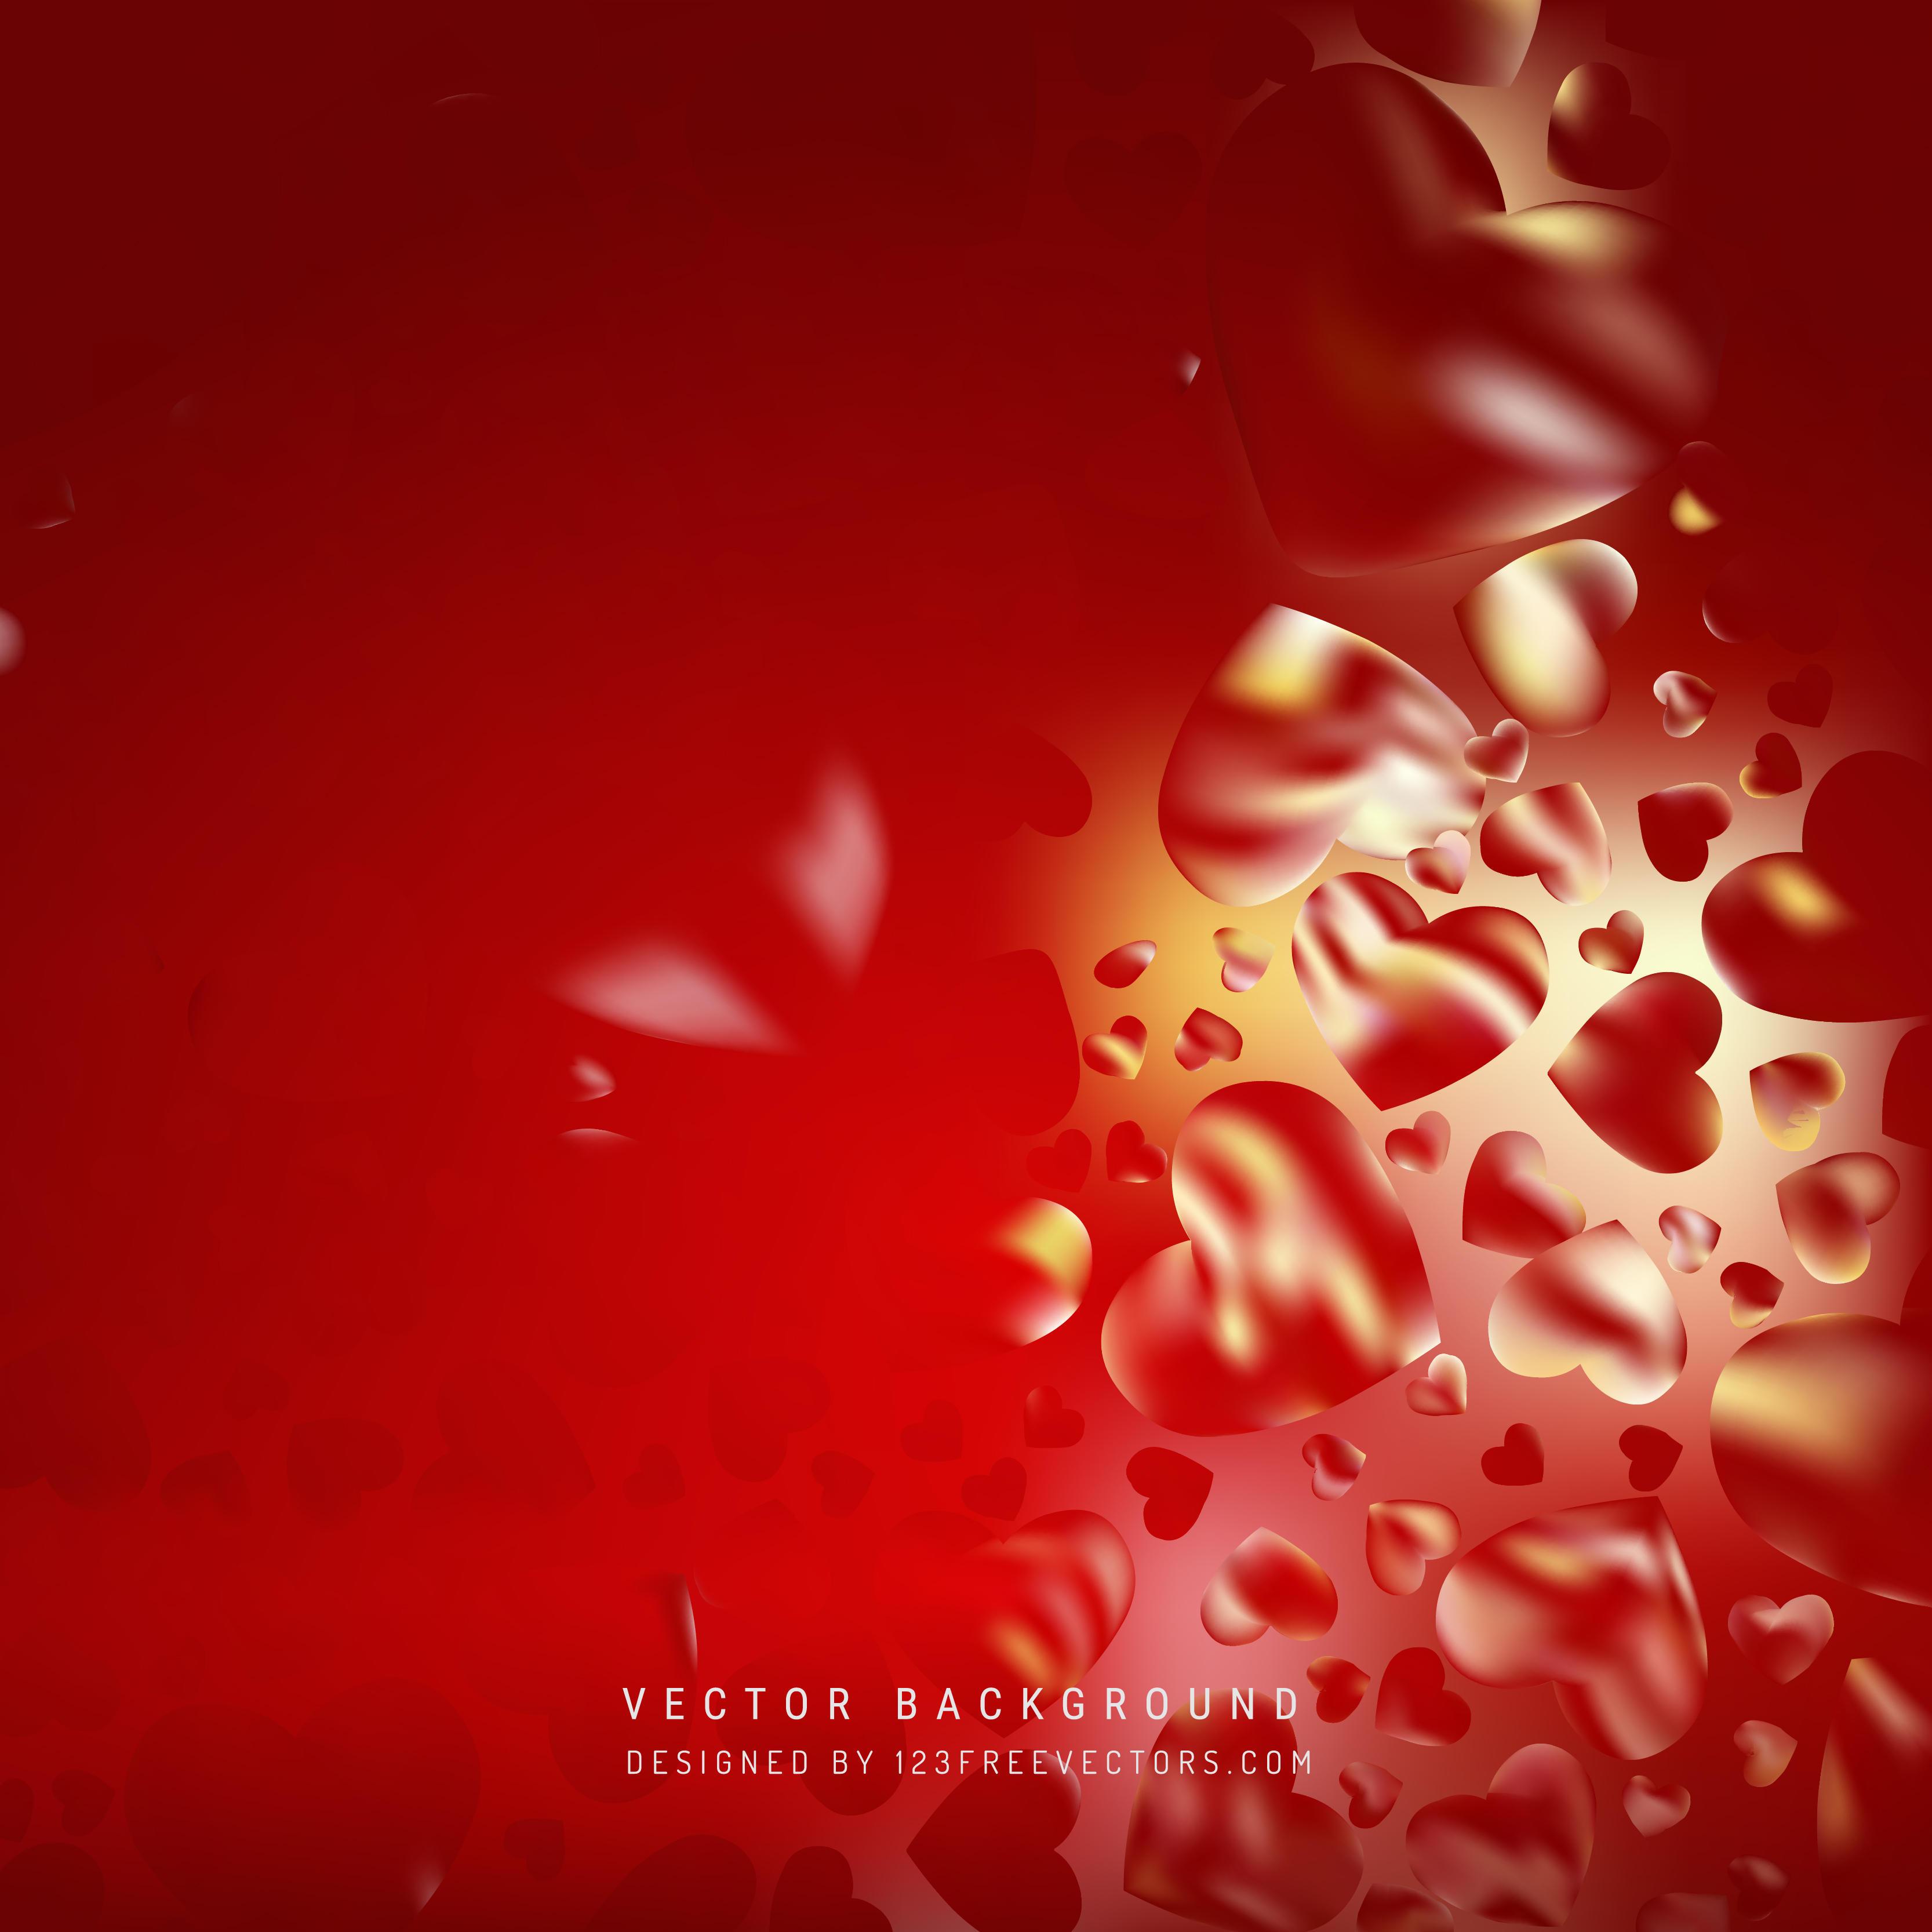 3230 valentines day vectors vectors download free vector art